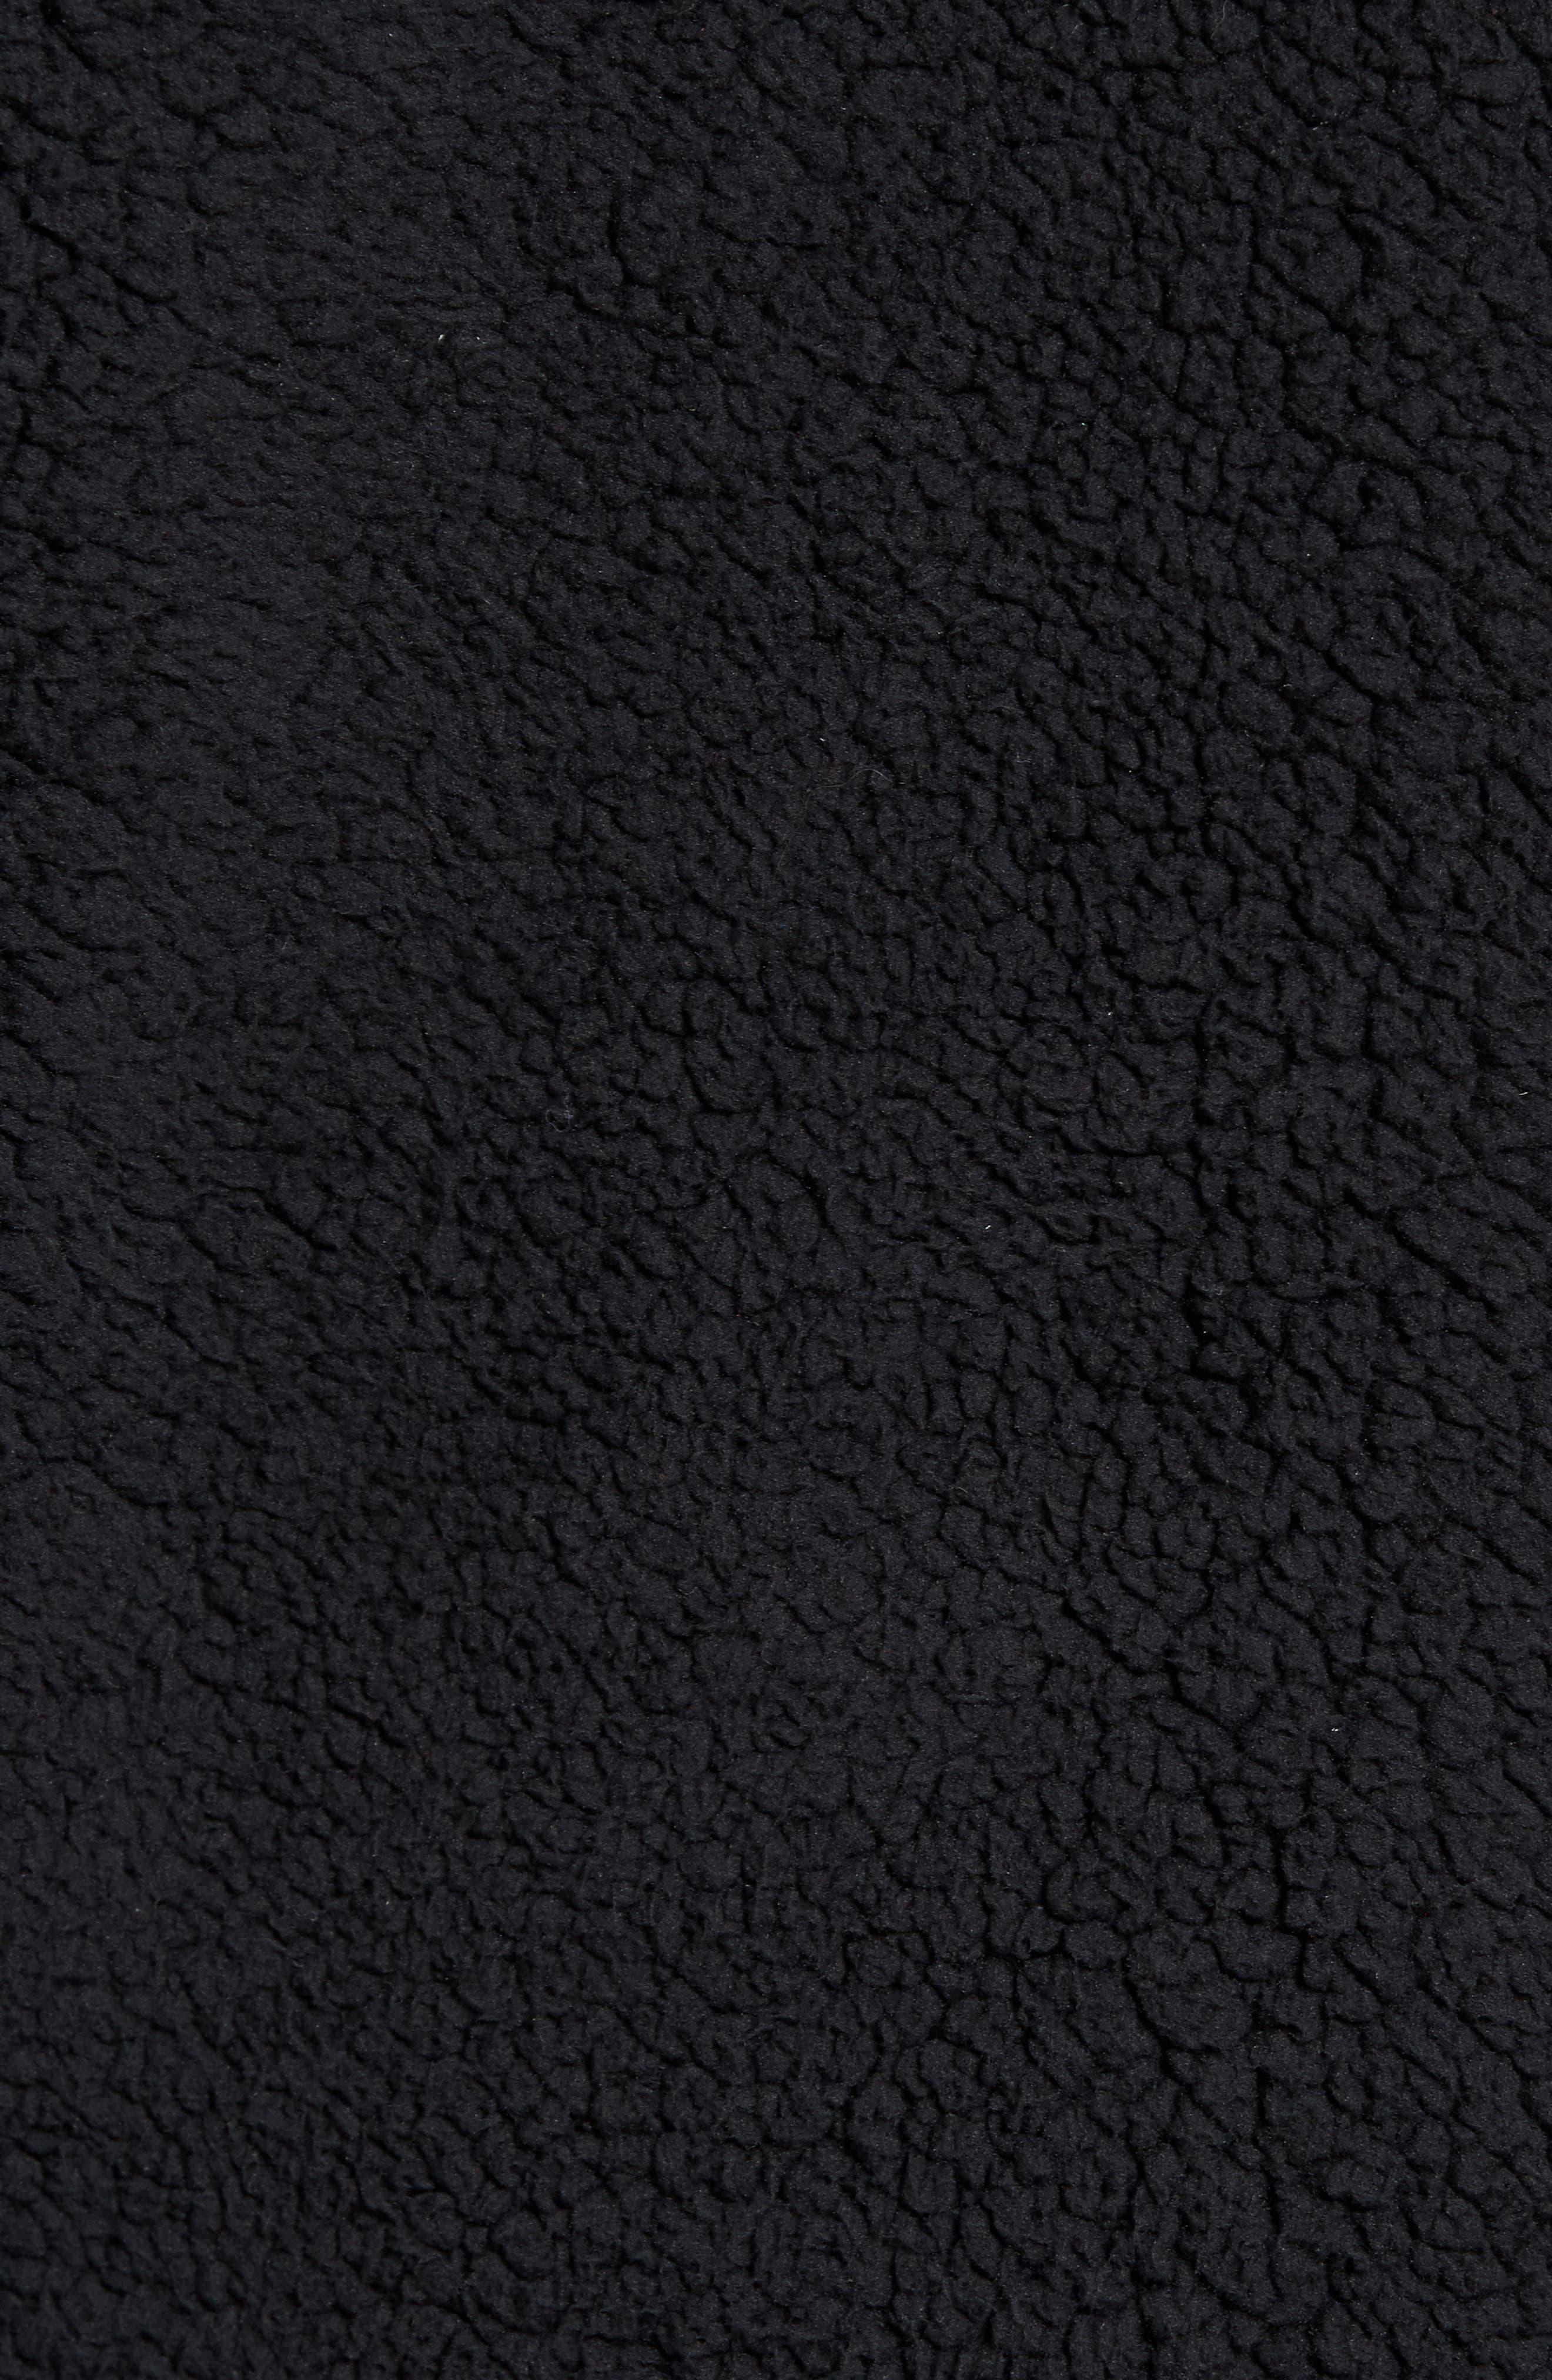 Sportswear Harborside Heavyweight Fleece Vest,                             Alternate thumbnail 6, color,                             010